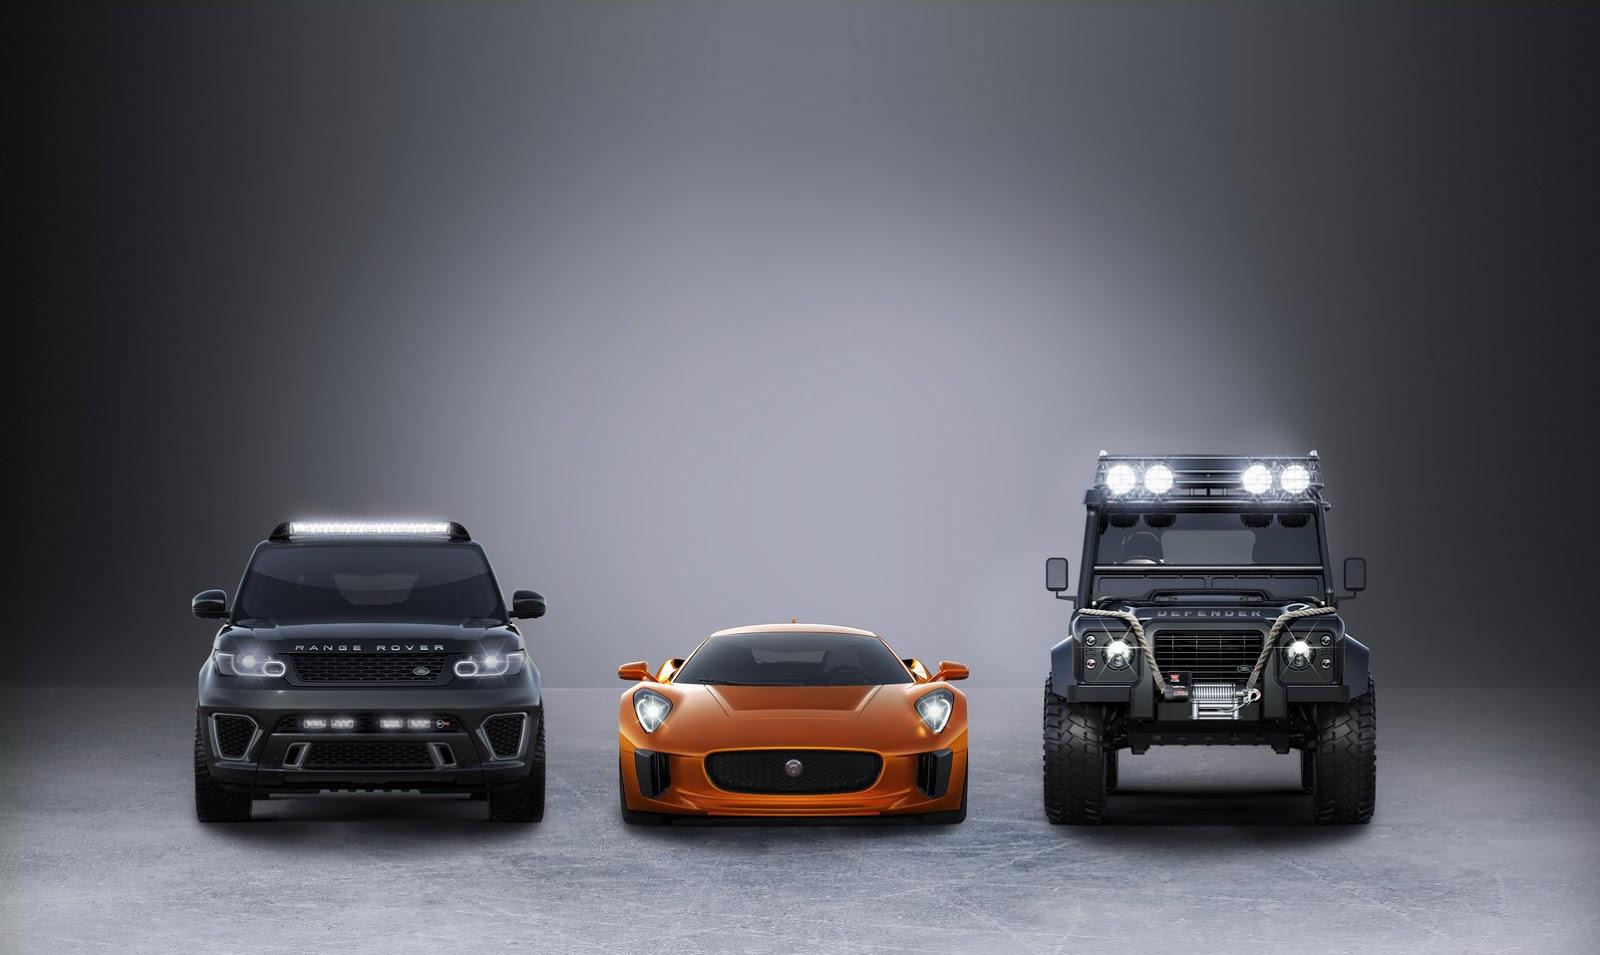 jaguar land rover 39 s trio of cars for new james bond movie spectre carscoops. Black Bedroom Furniture Sets. Home Design Ideas